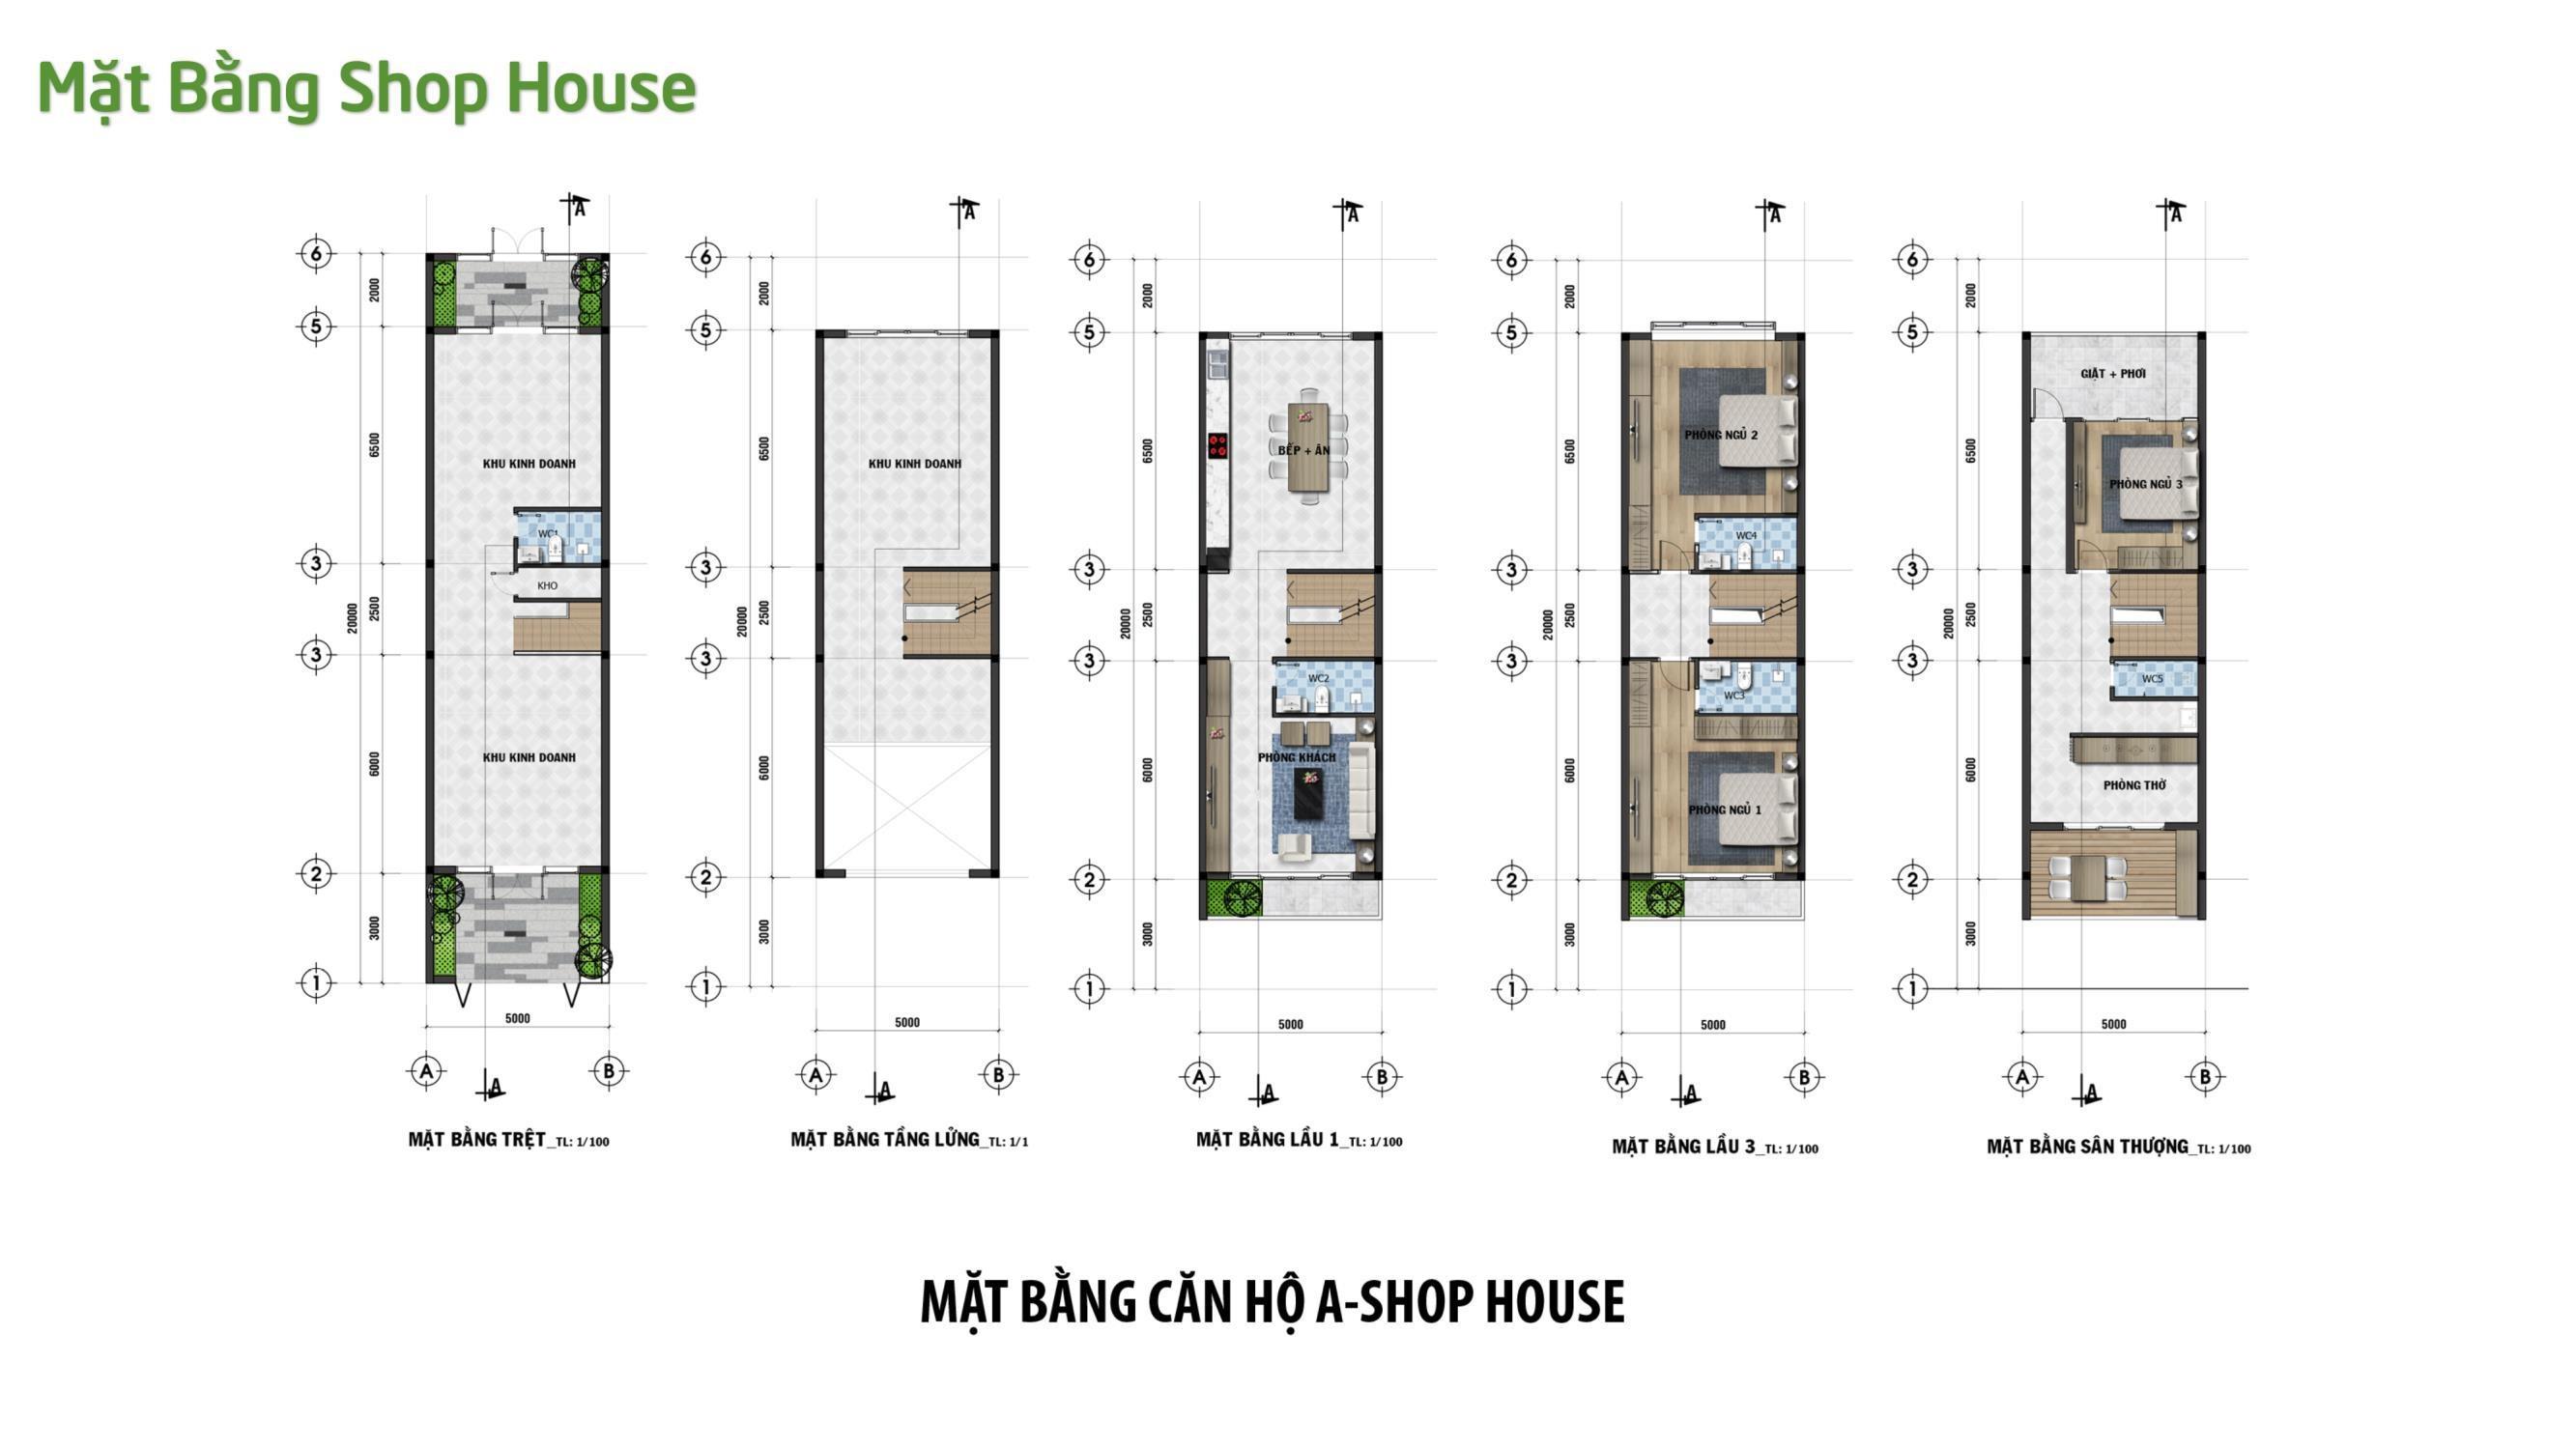 mat bang shophouse quan 9